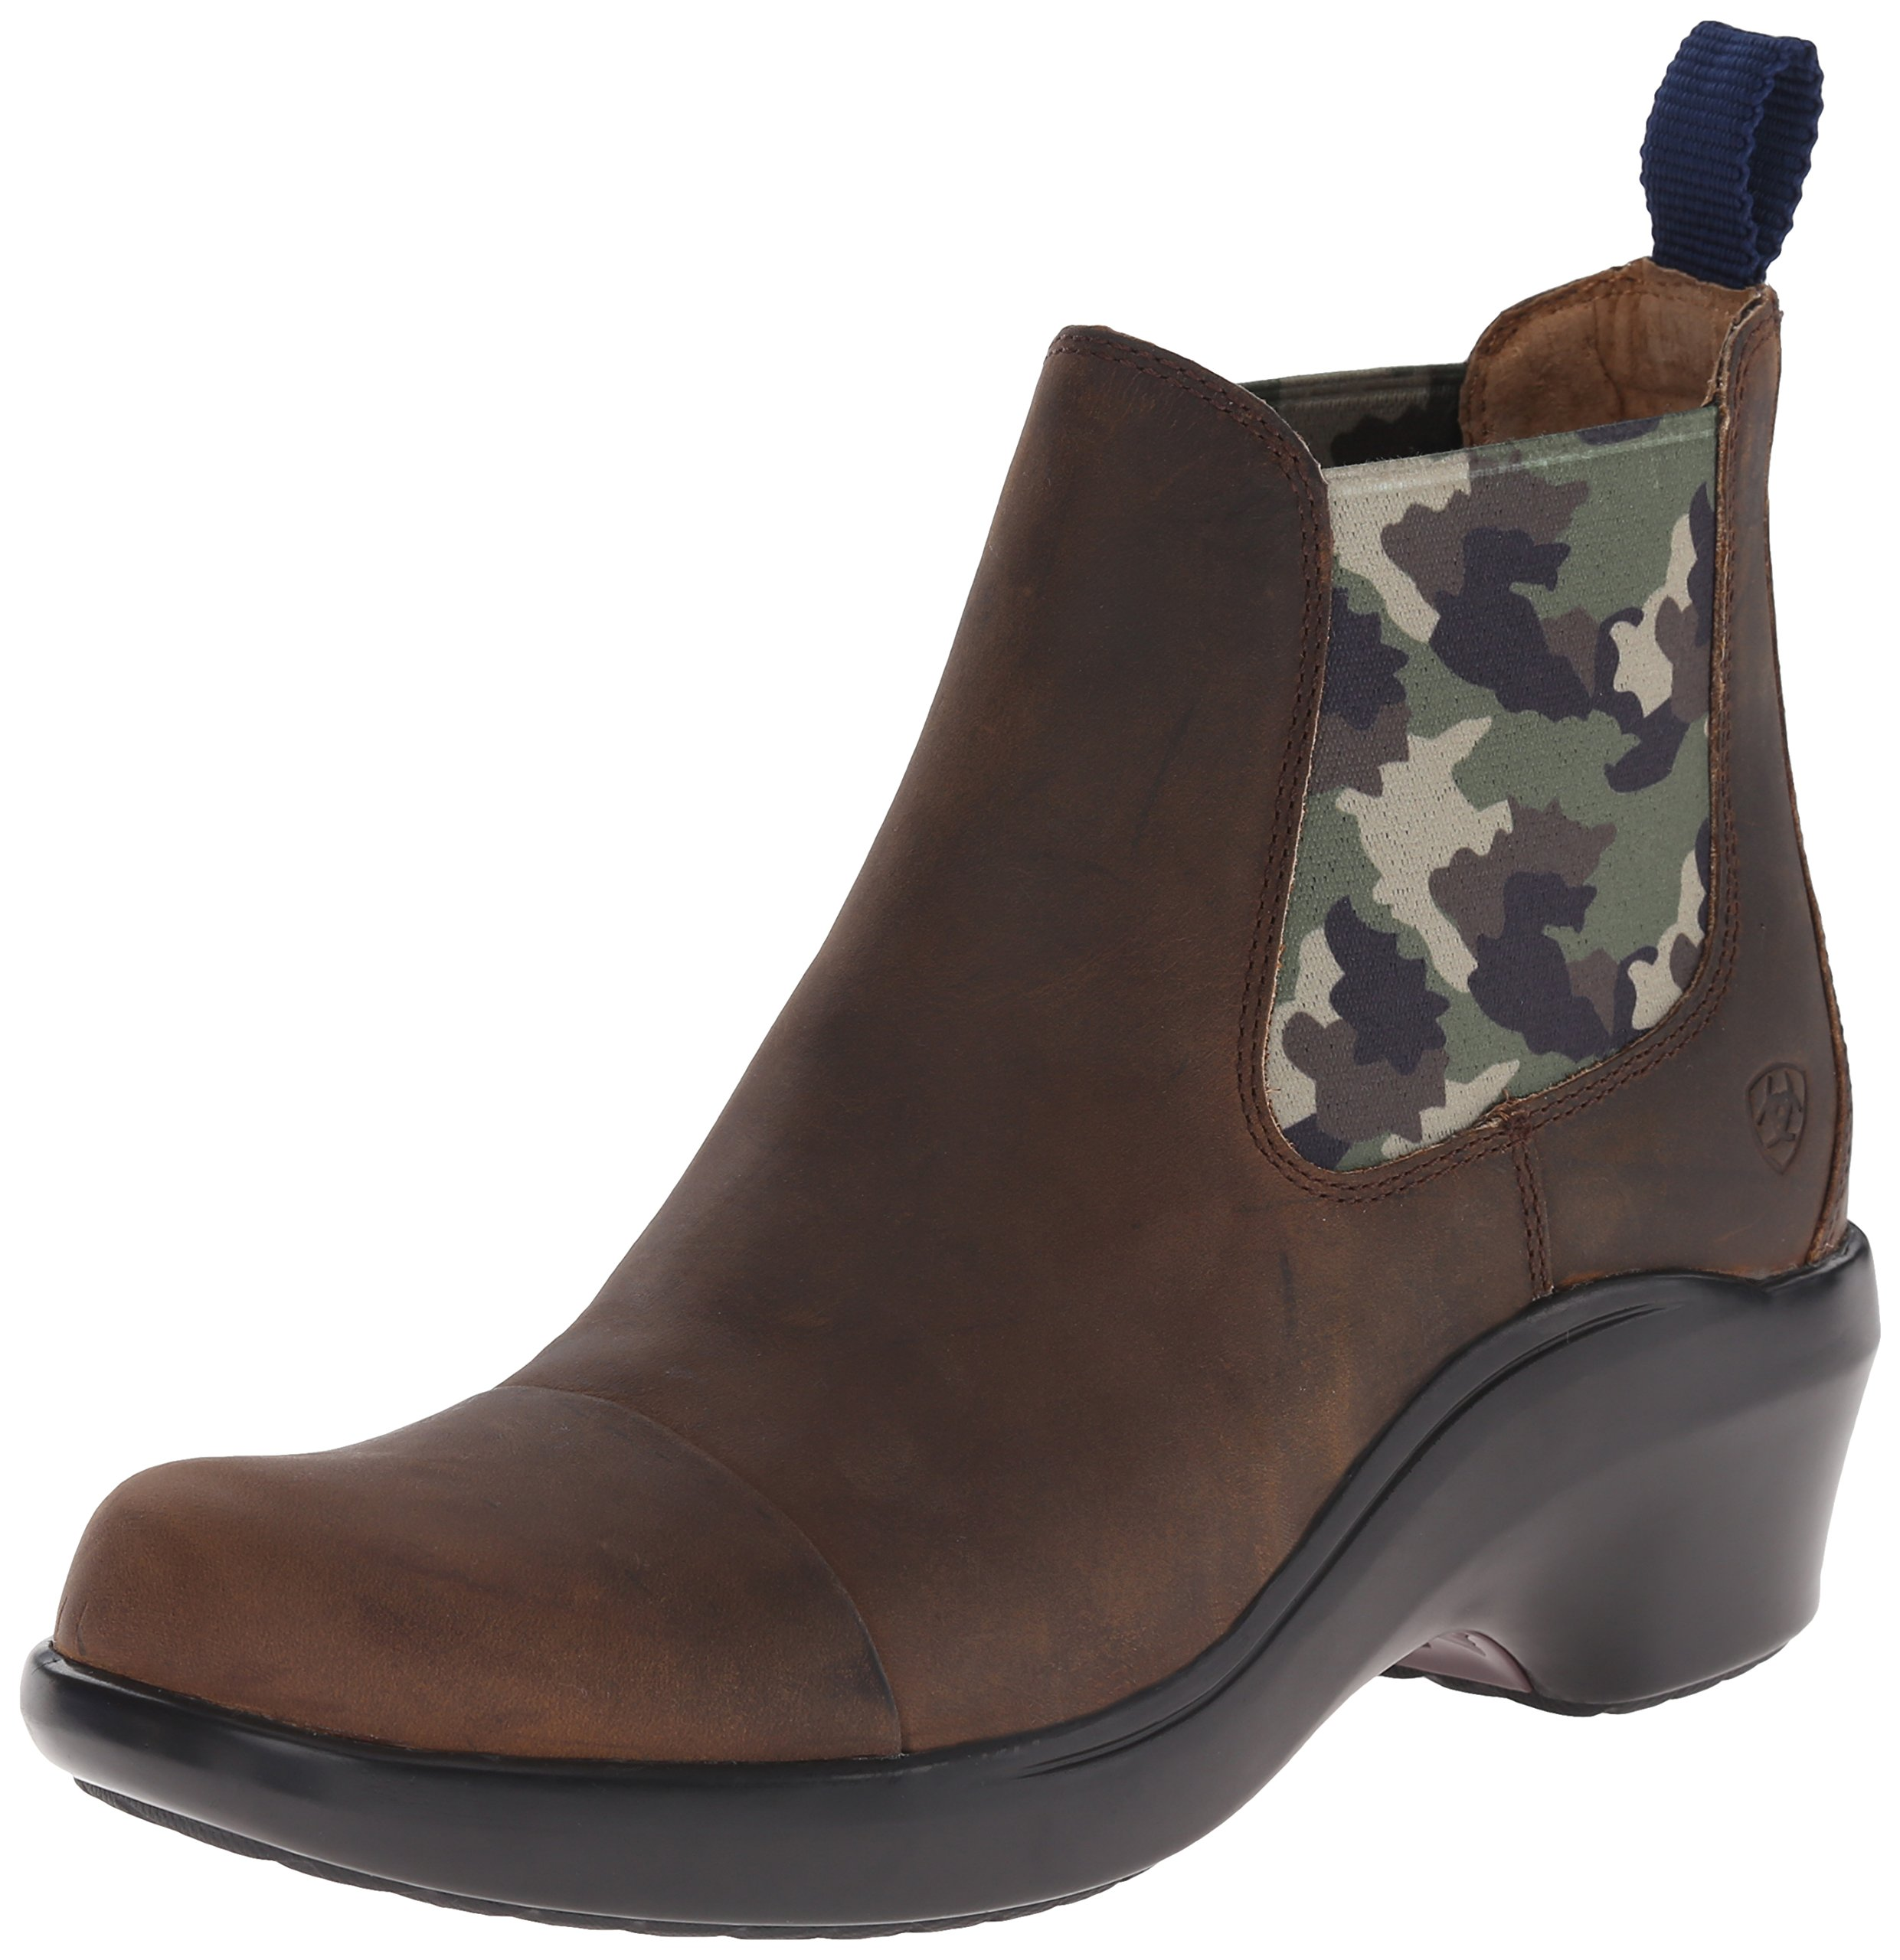 Ariat Women's Chelsea Fashion Boot,  Chocolate,  11 M US